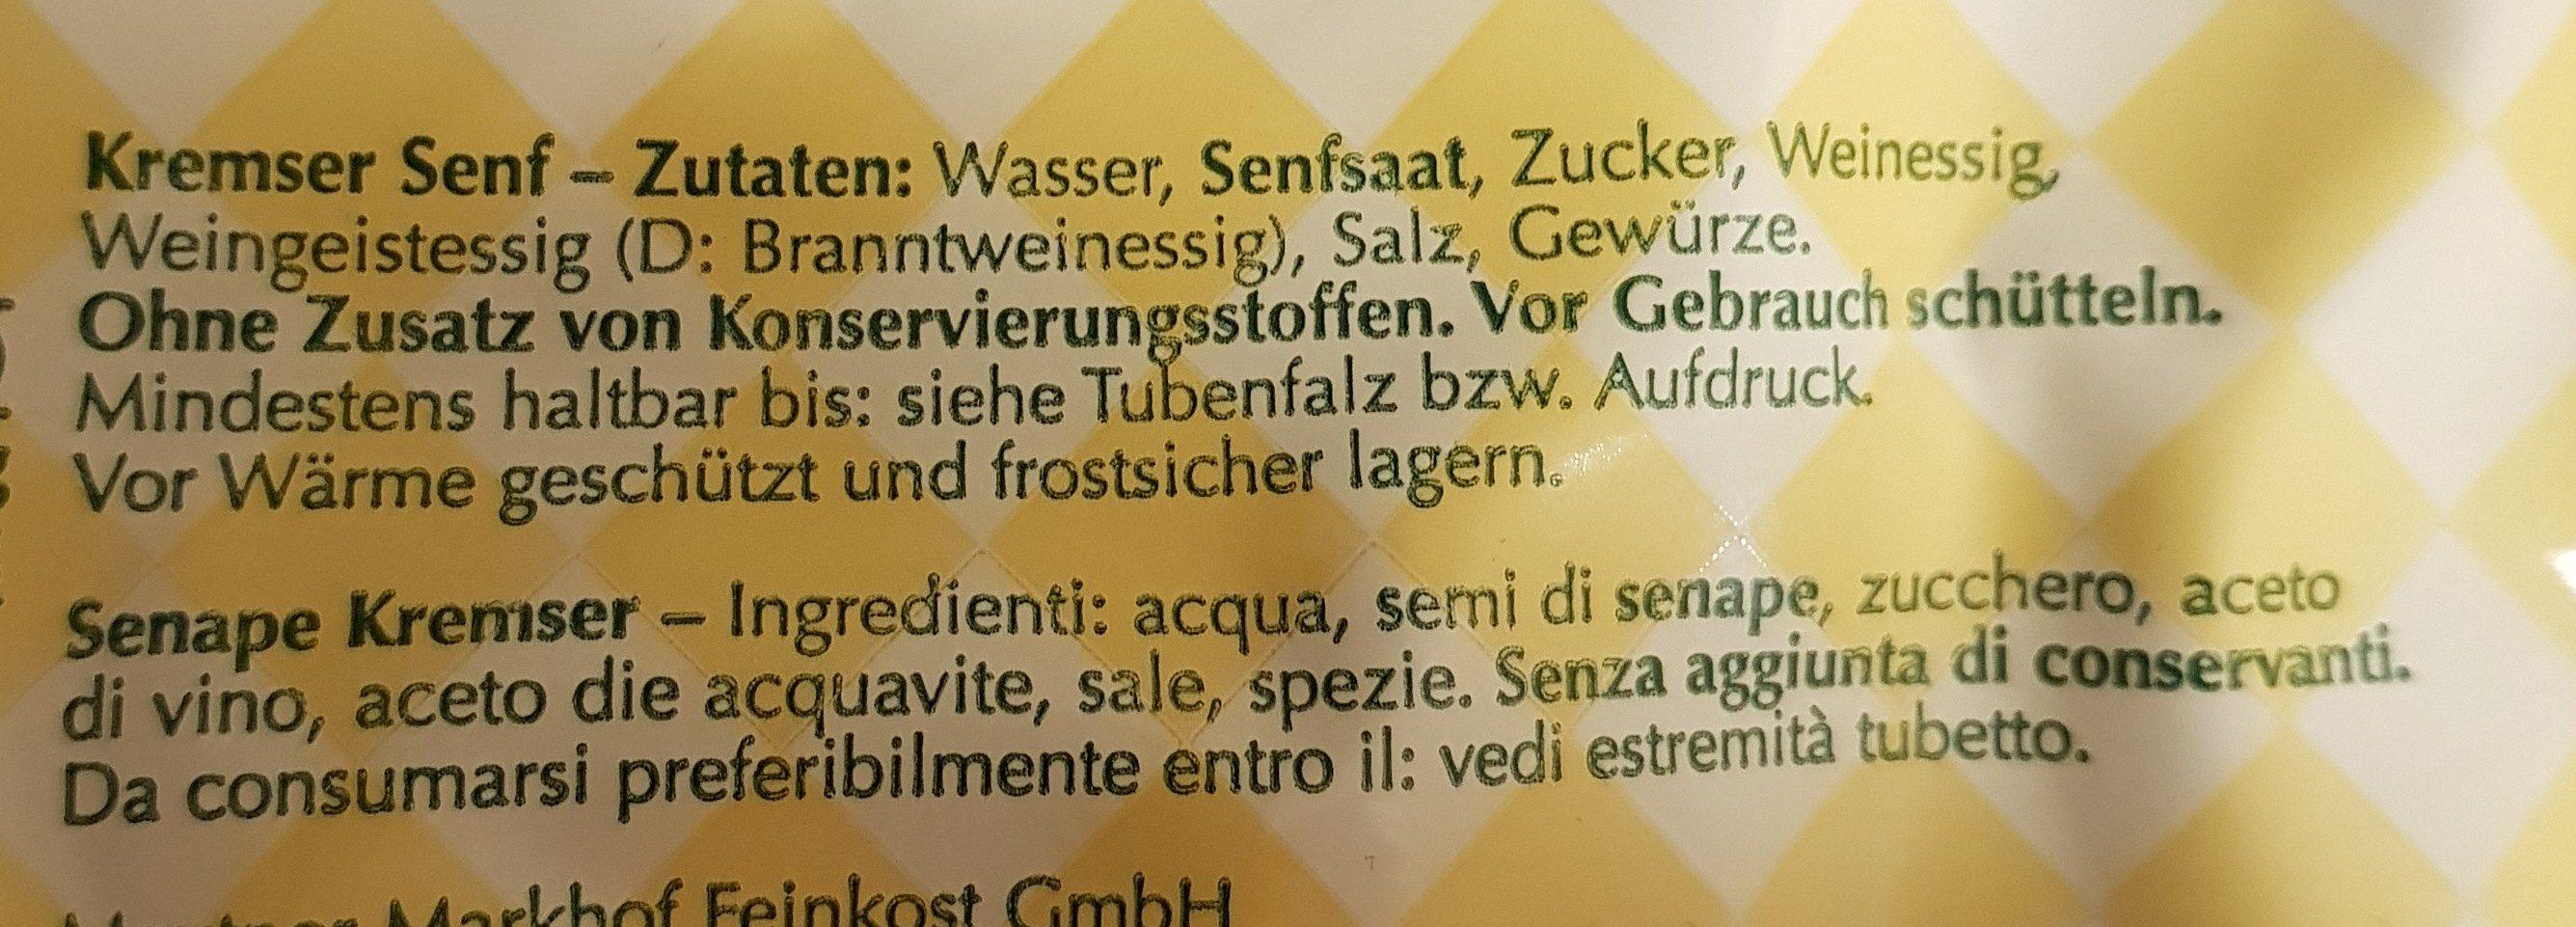 Kremser senf - Ingredients - de